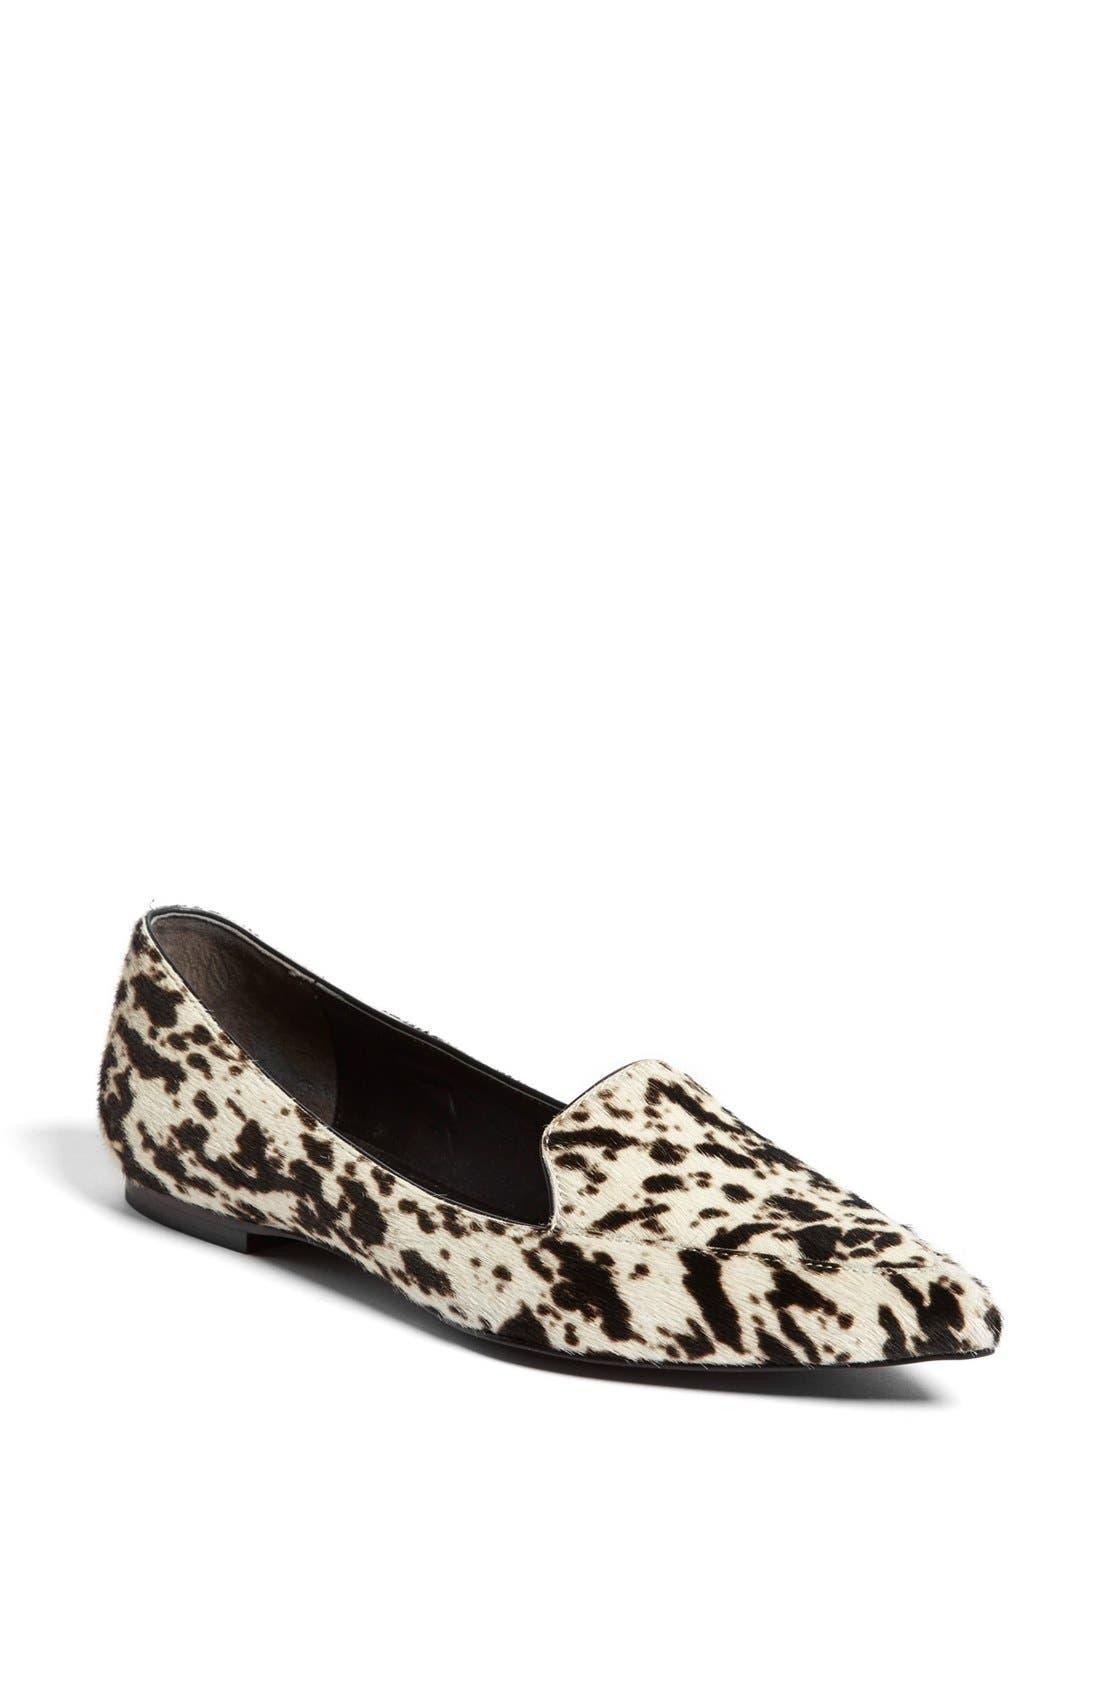 3.1 PHILLIP LIM Loafer, Main, color, 001